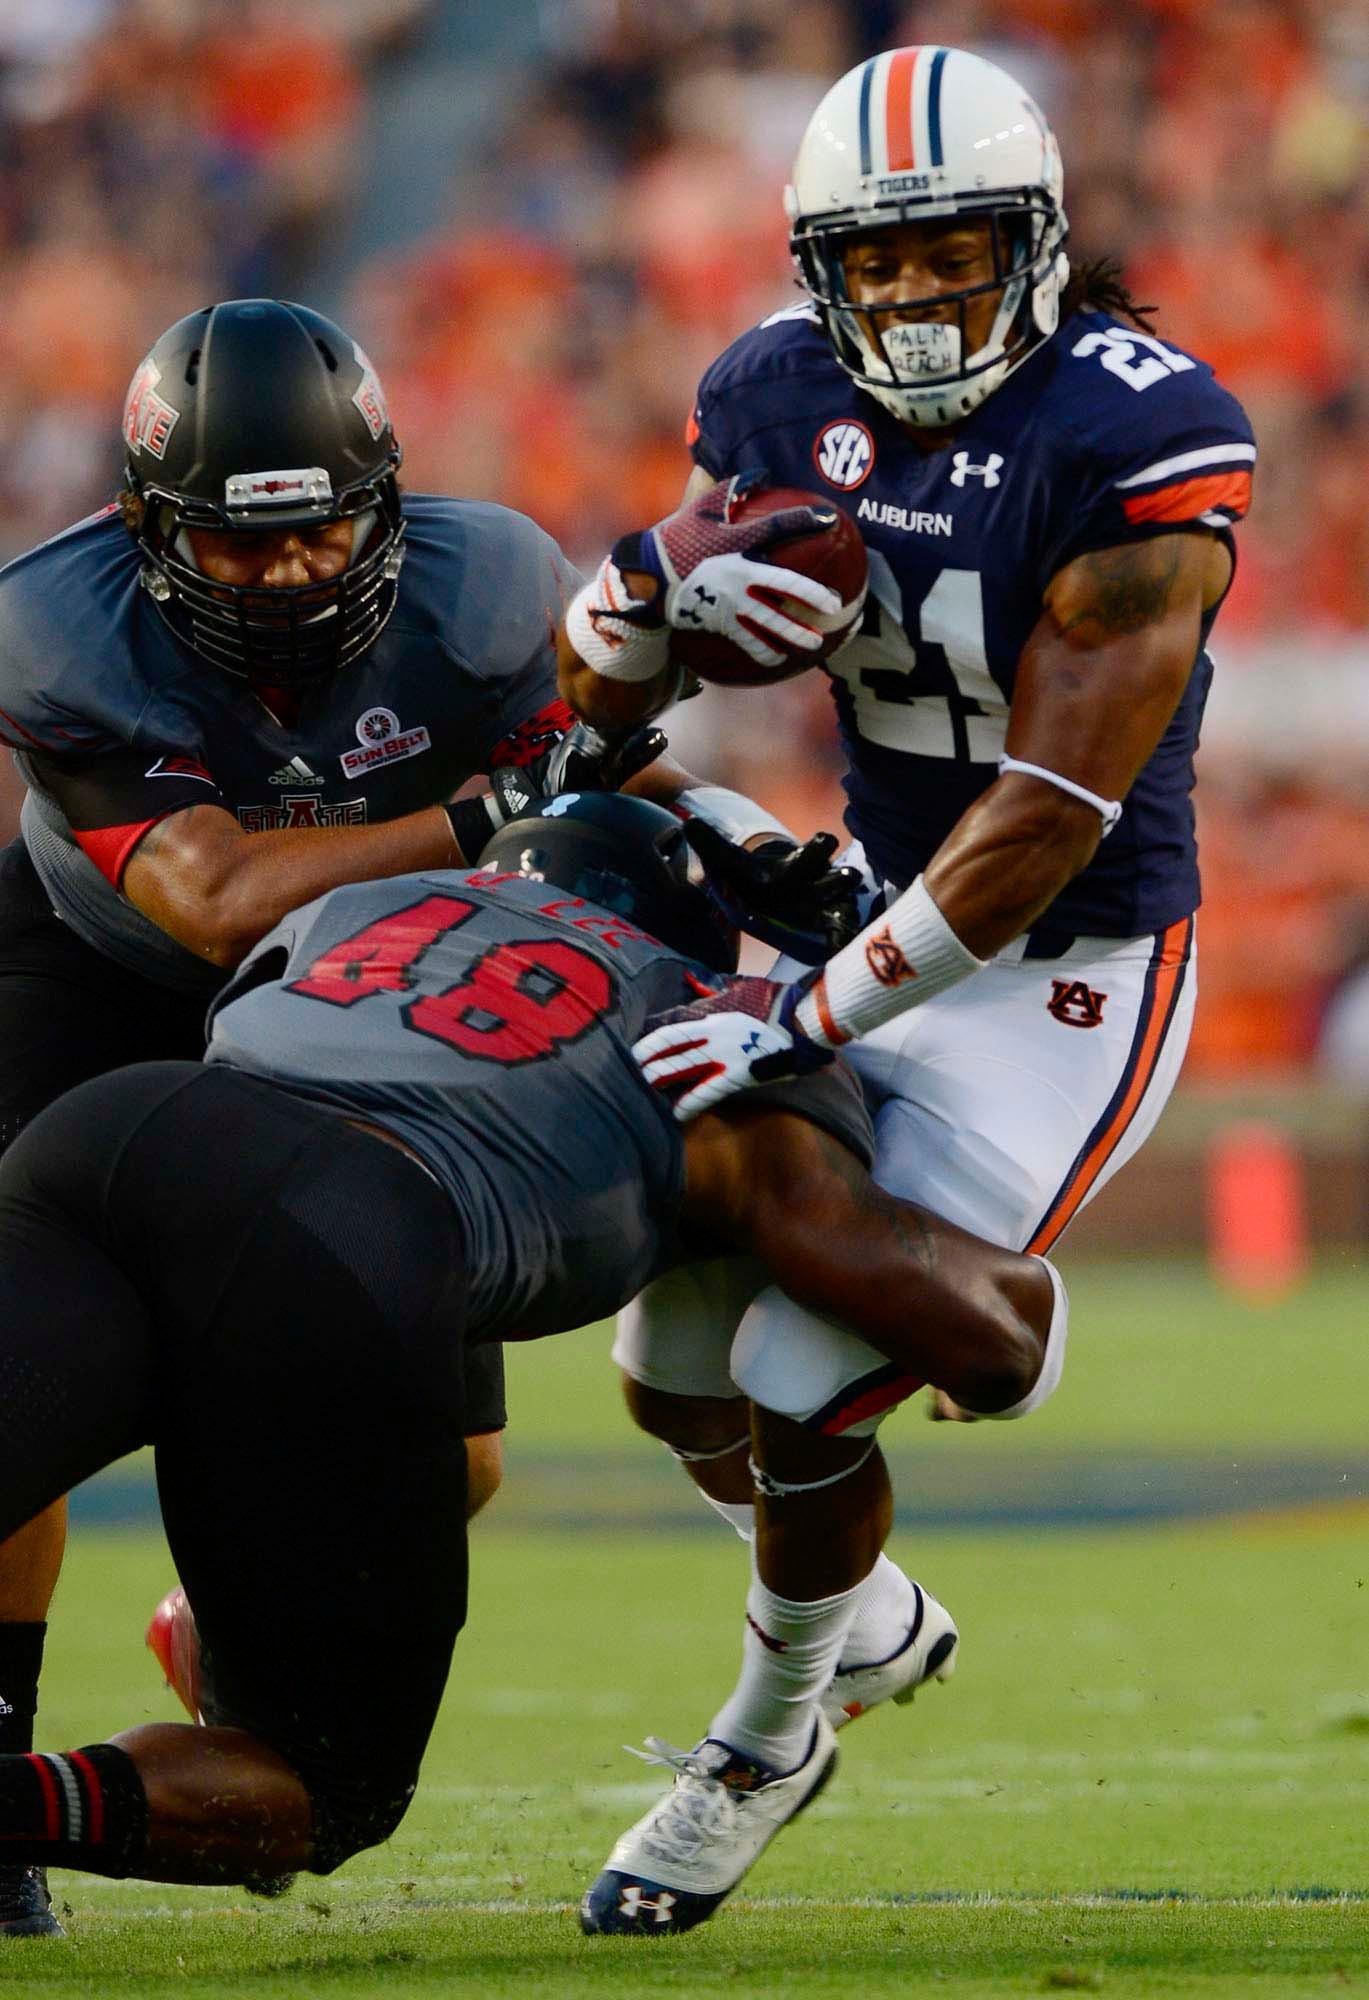 Auburn running back Tre Mason picks up some of his 99 yards Saturday against Arkansas State. (Source: Todd Van Emst/Auburn University)